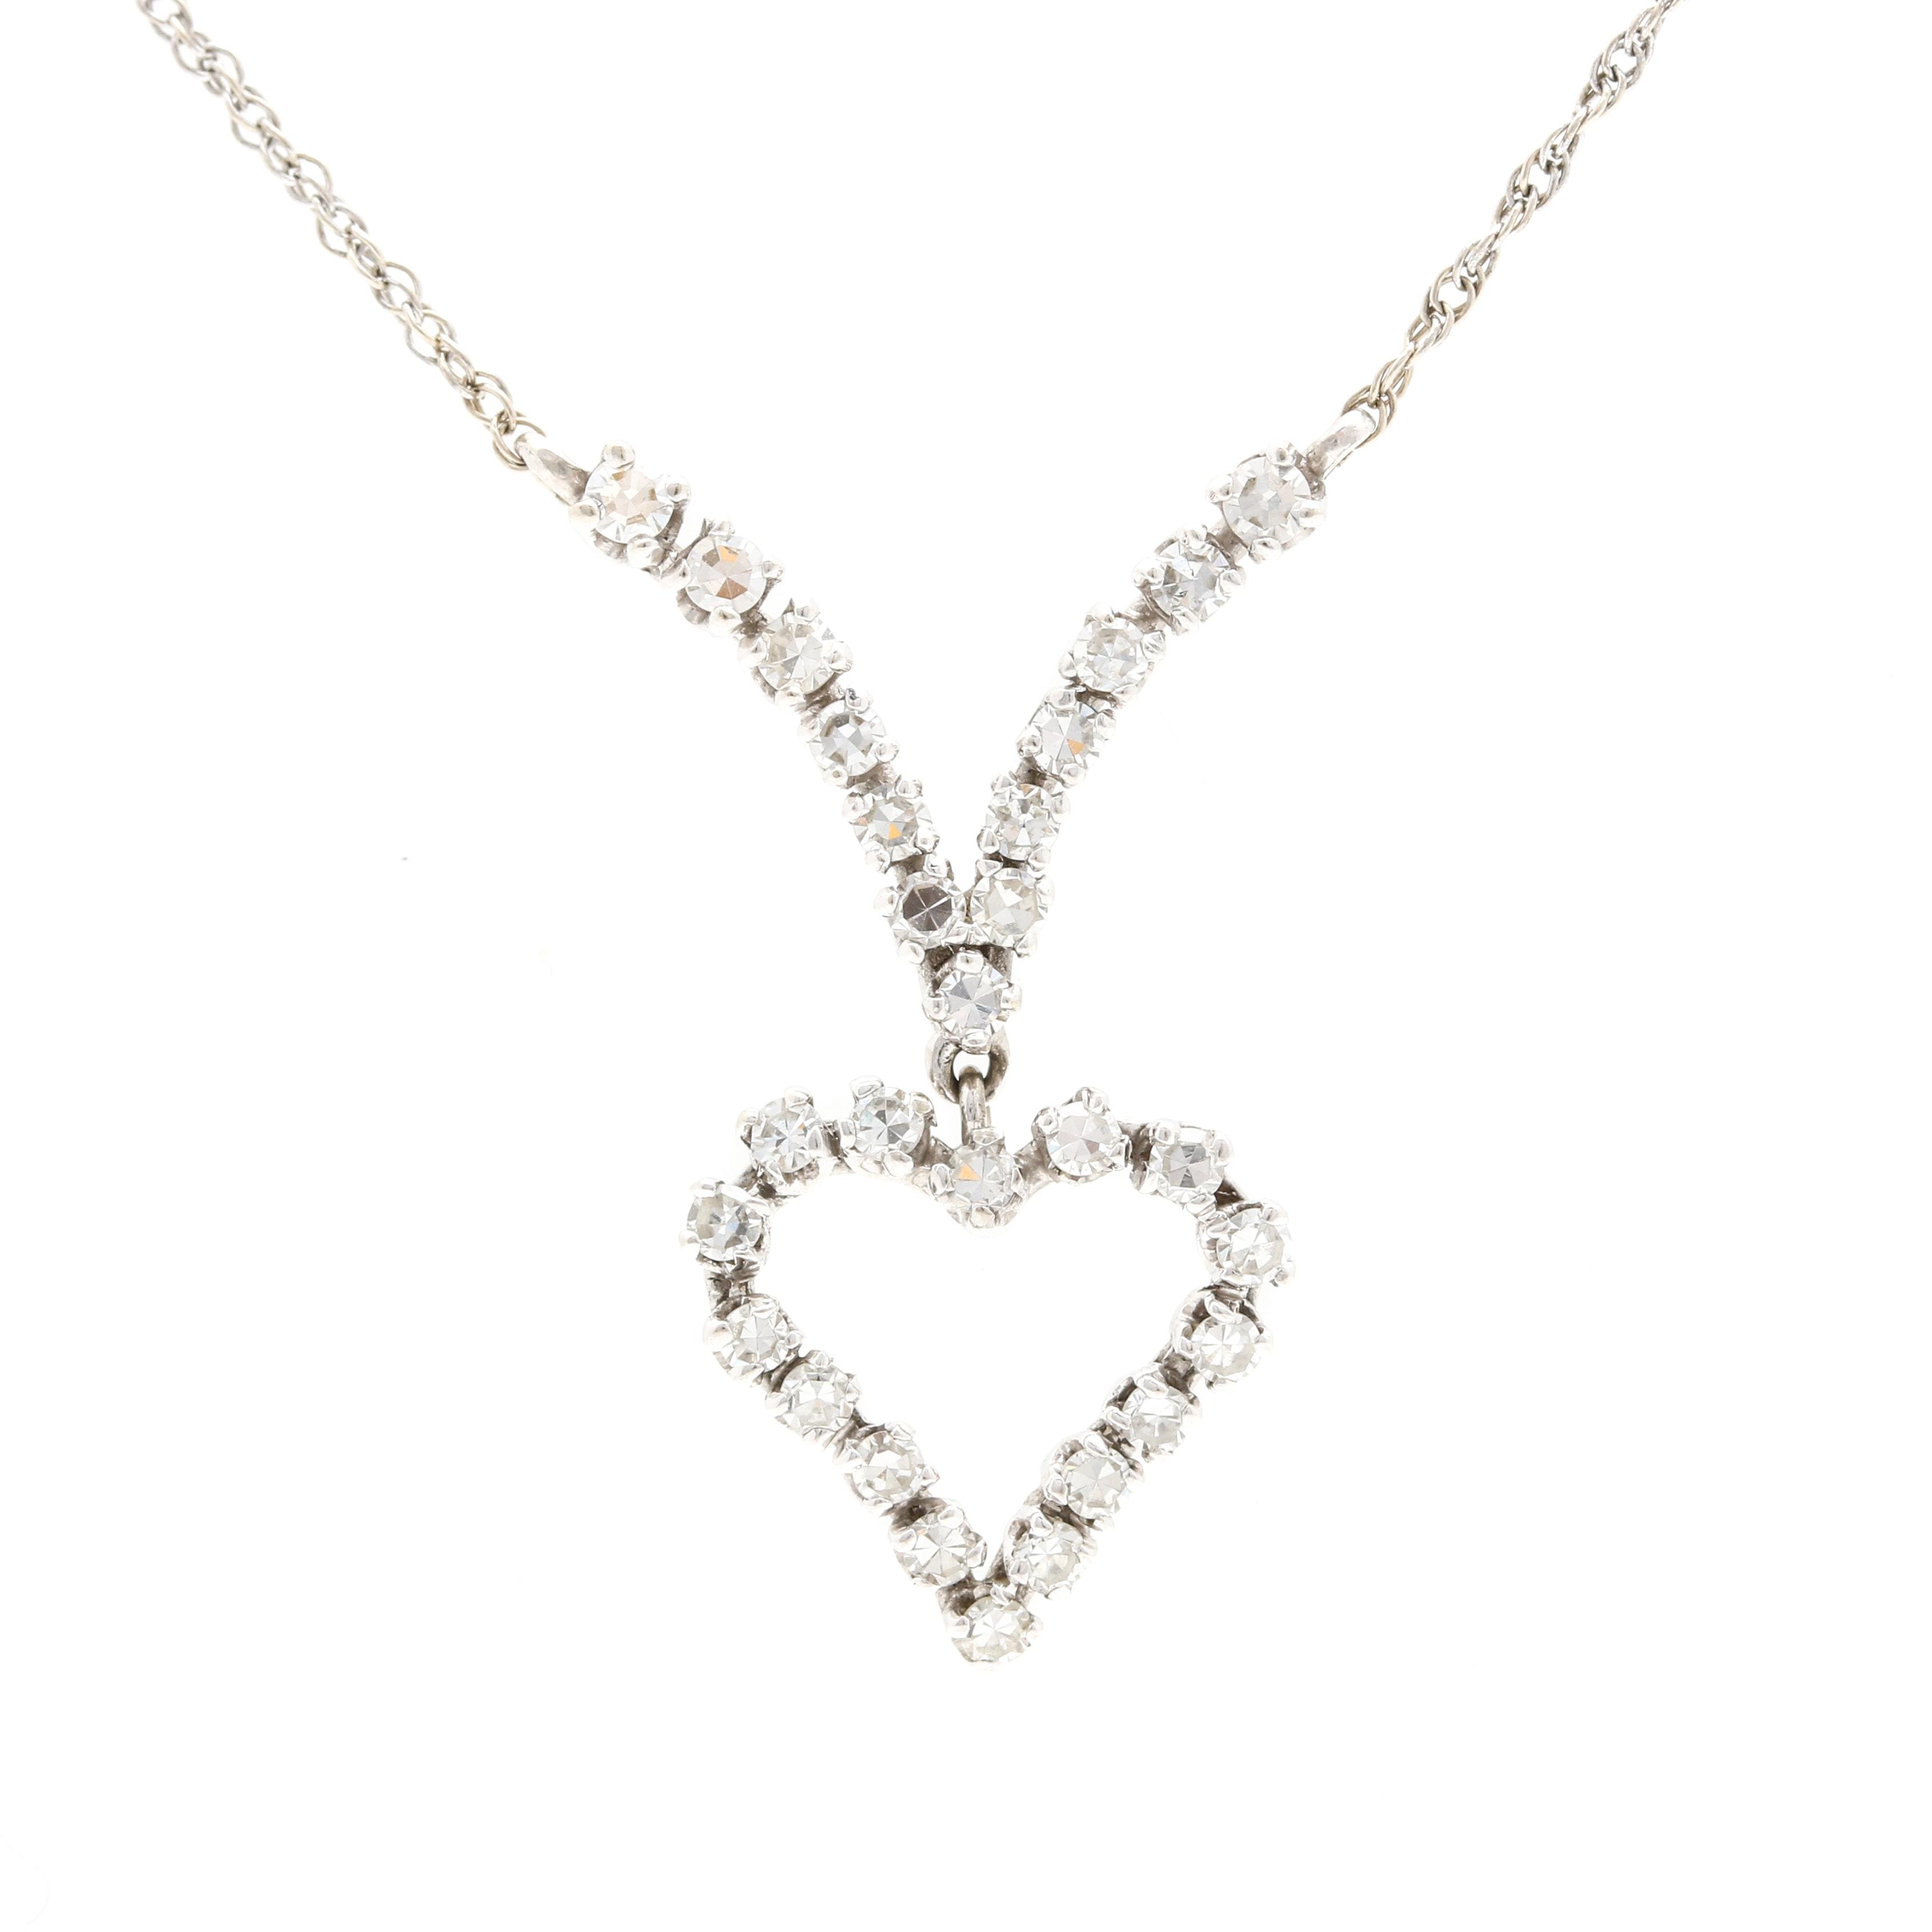 14K and 10K White Gold Diamond Necklace